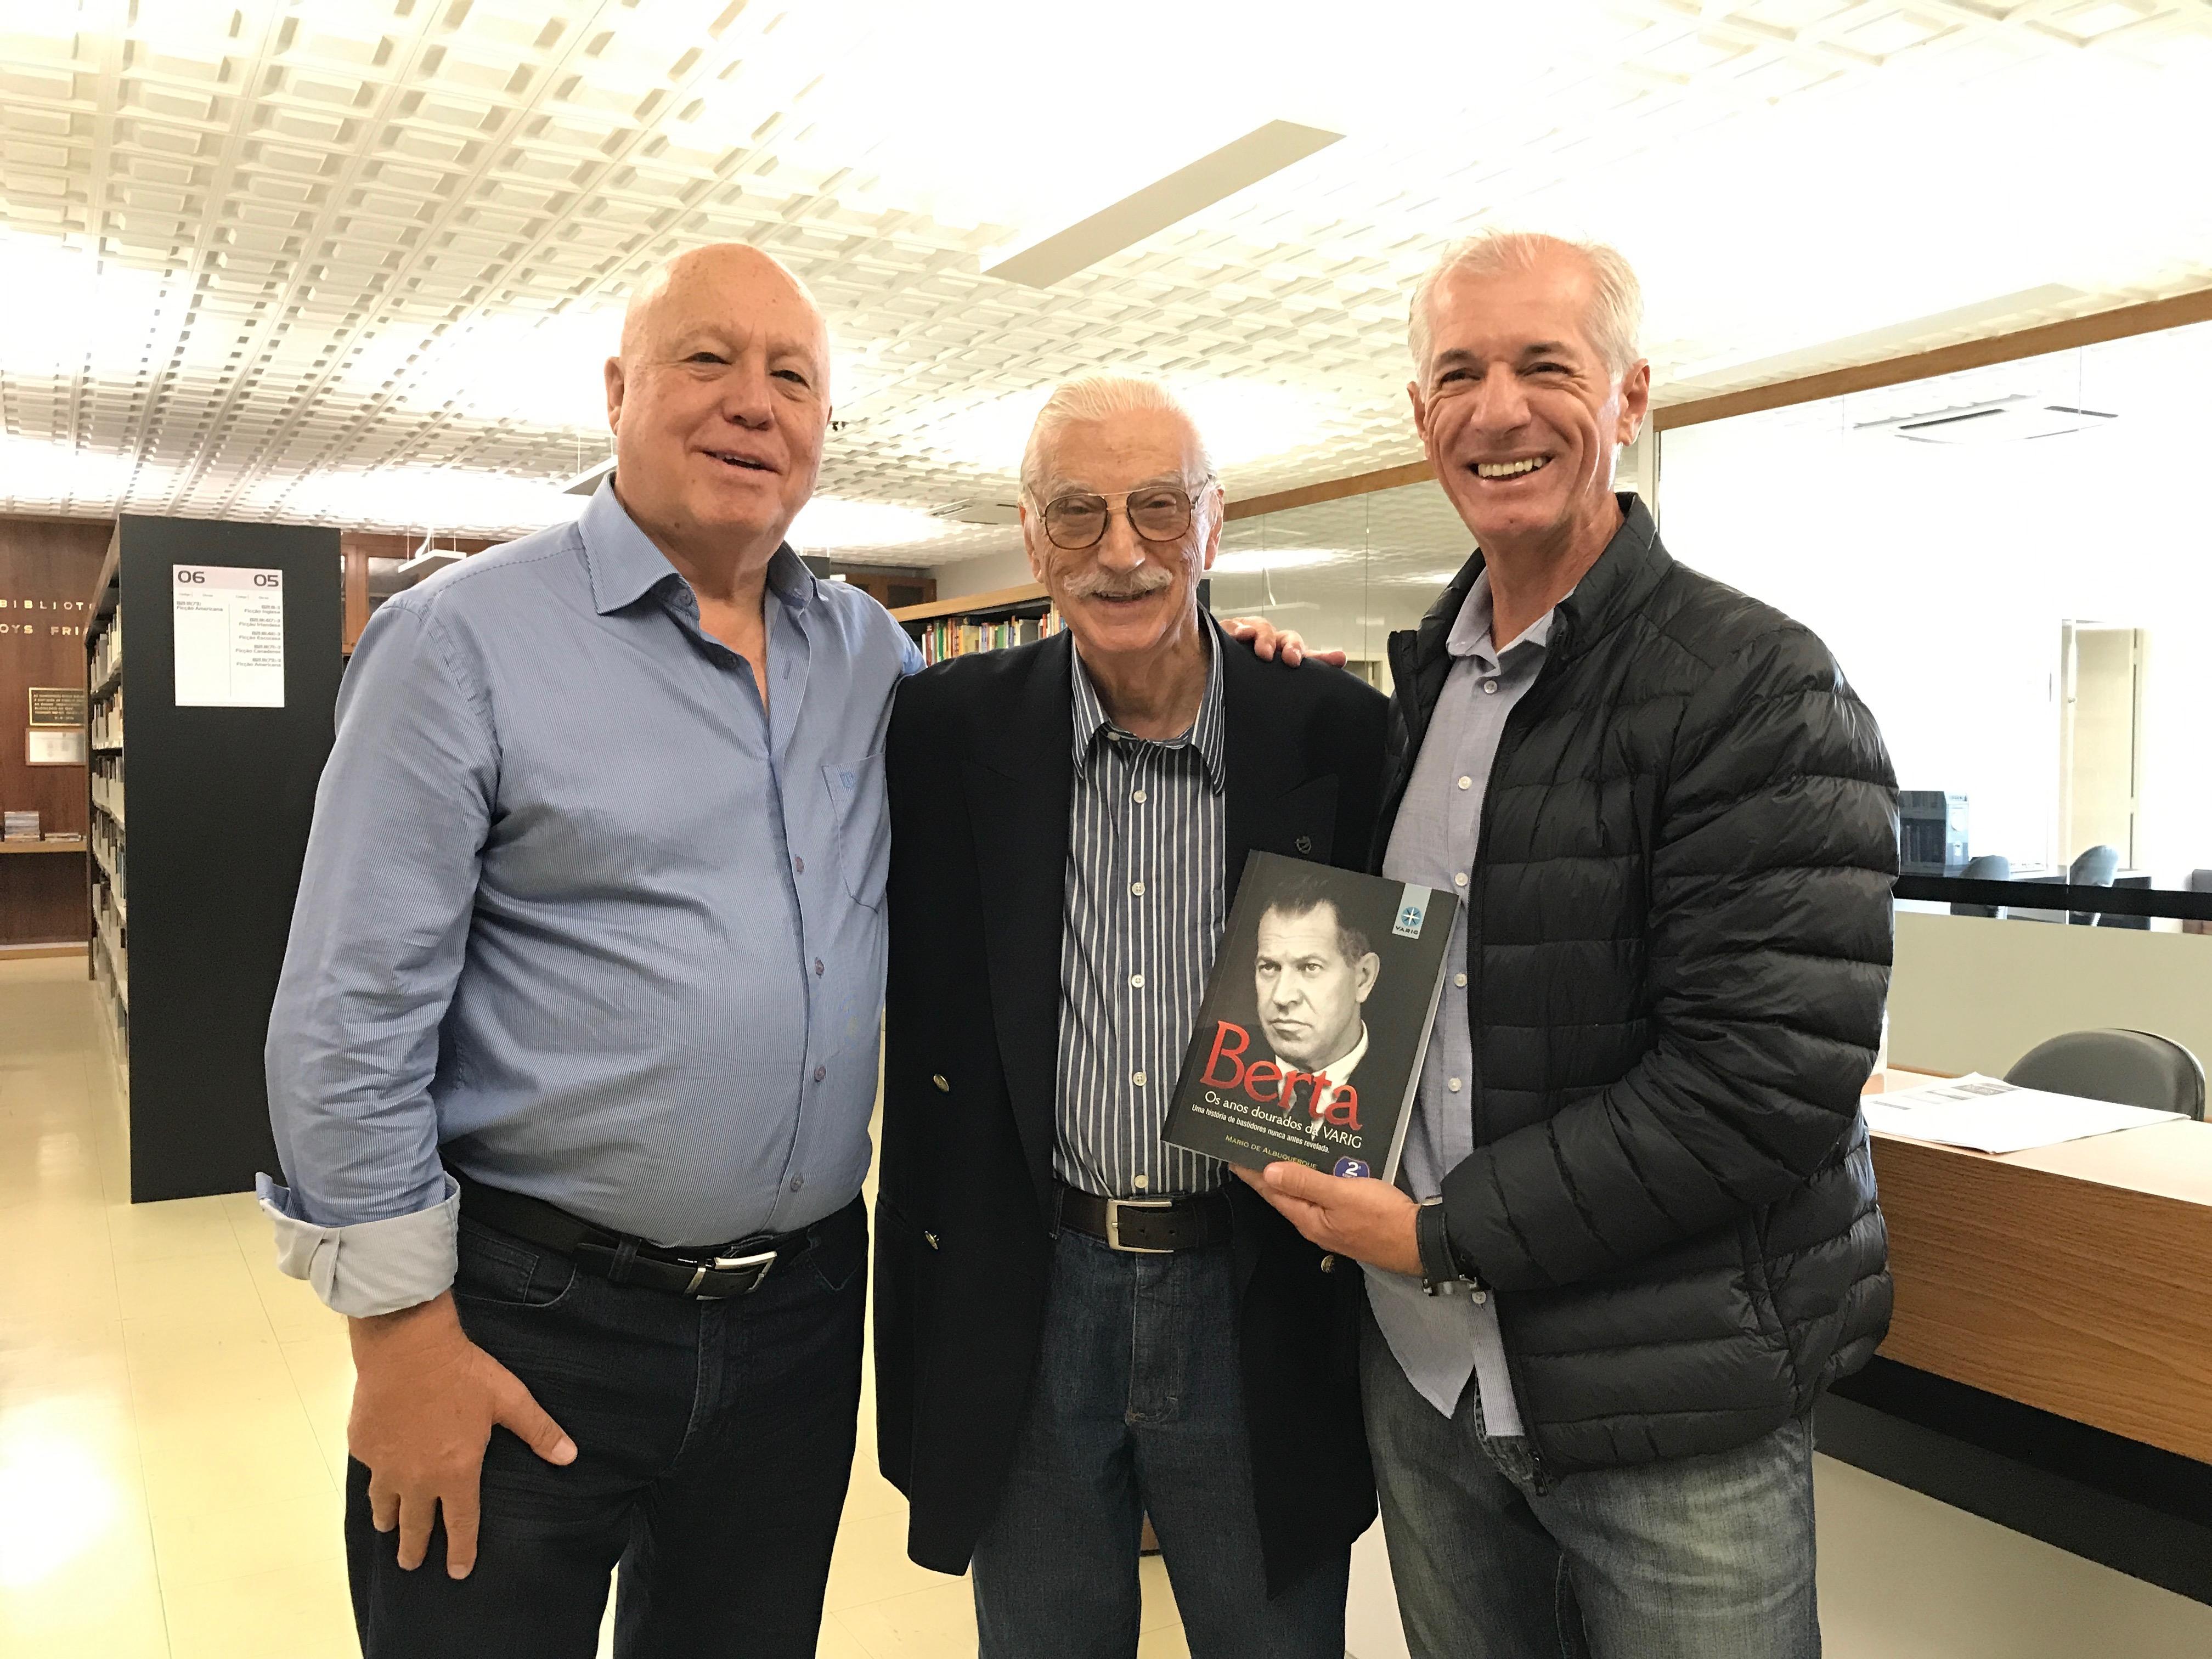 Hruby, Albuquerque e Wüppel no ato da entrega do livro